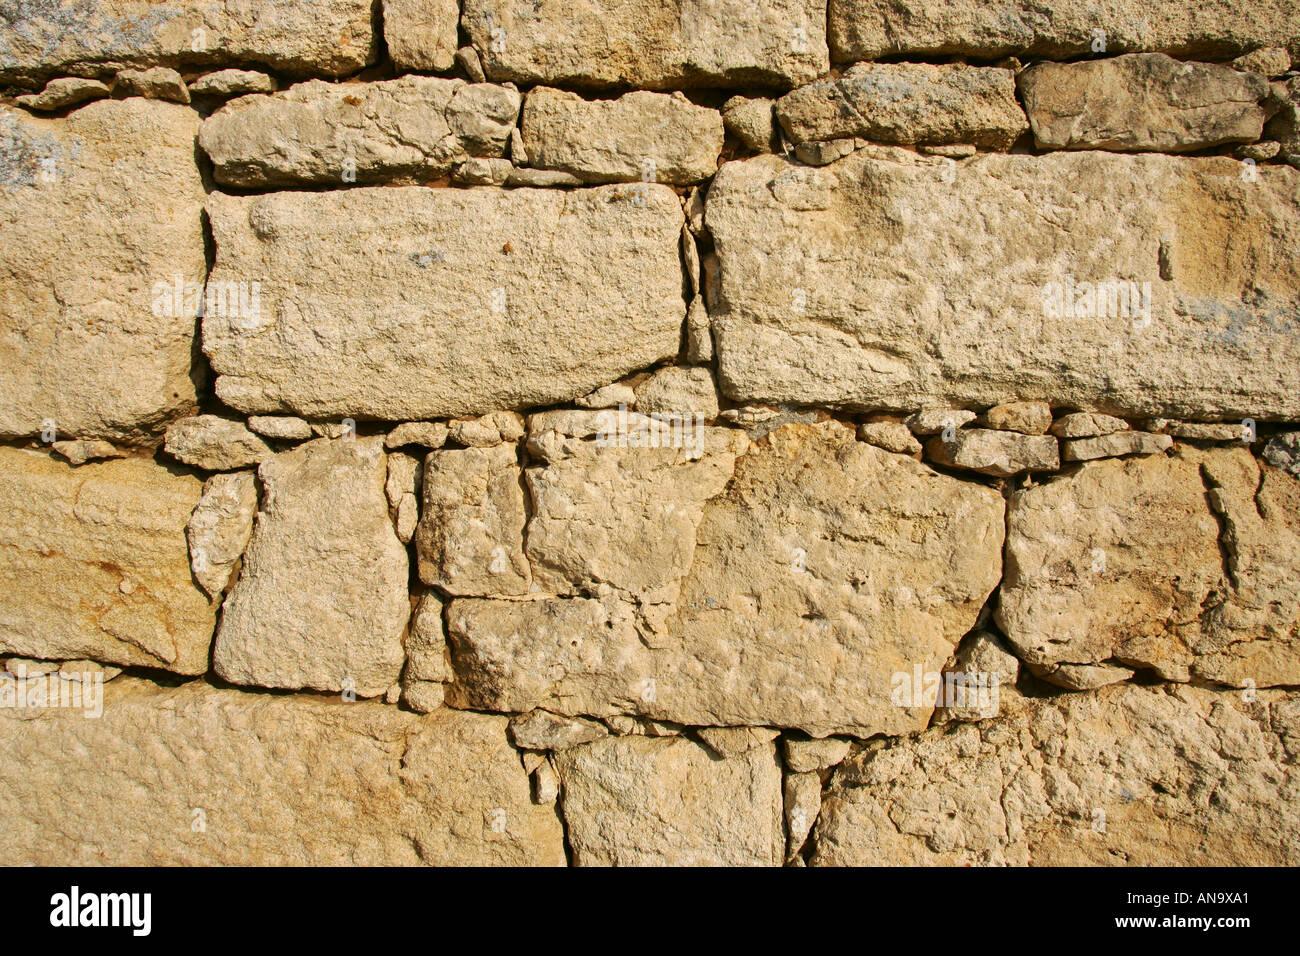 stone wall - Stock Image